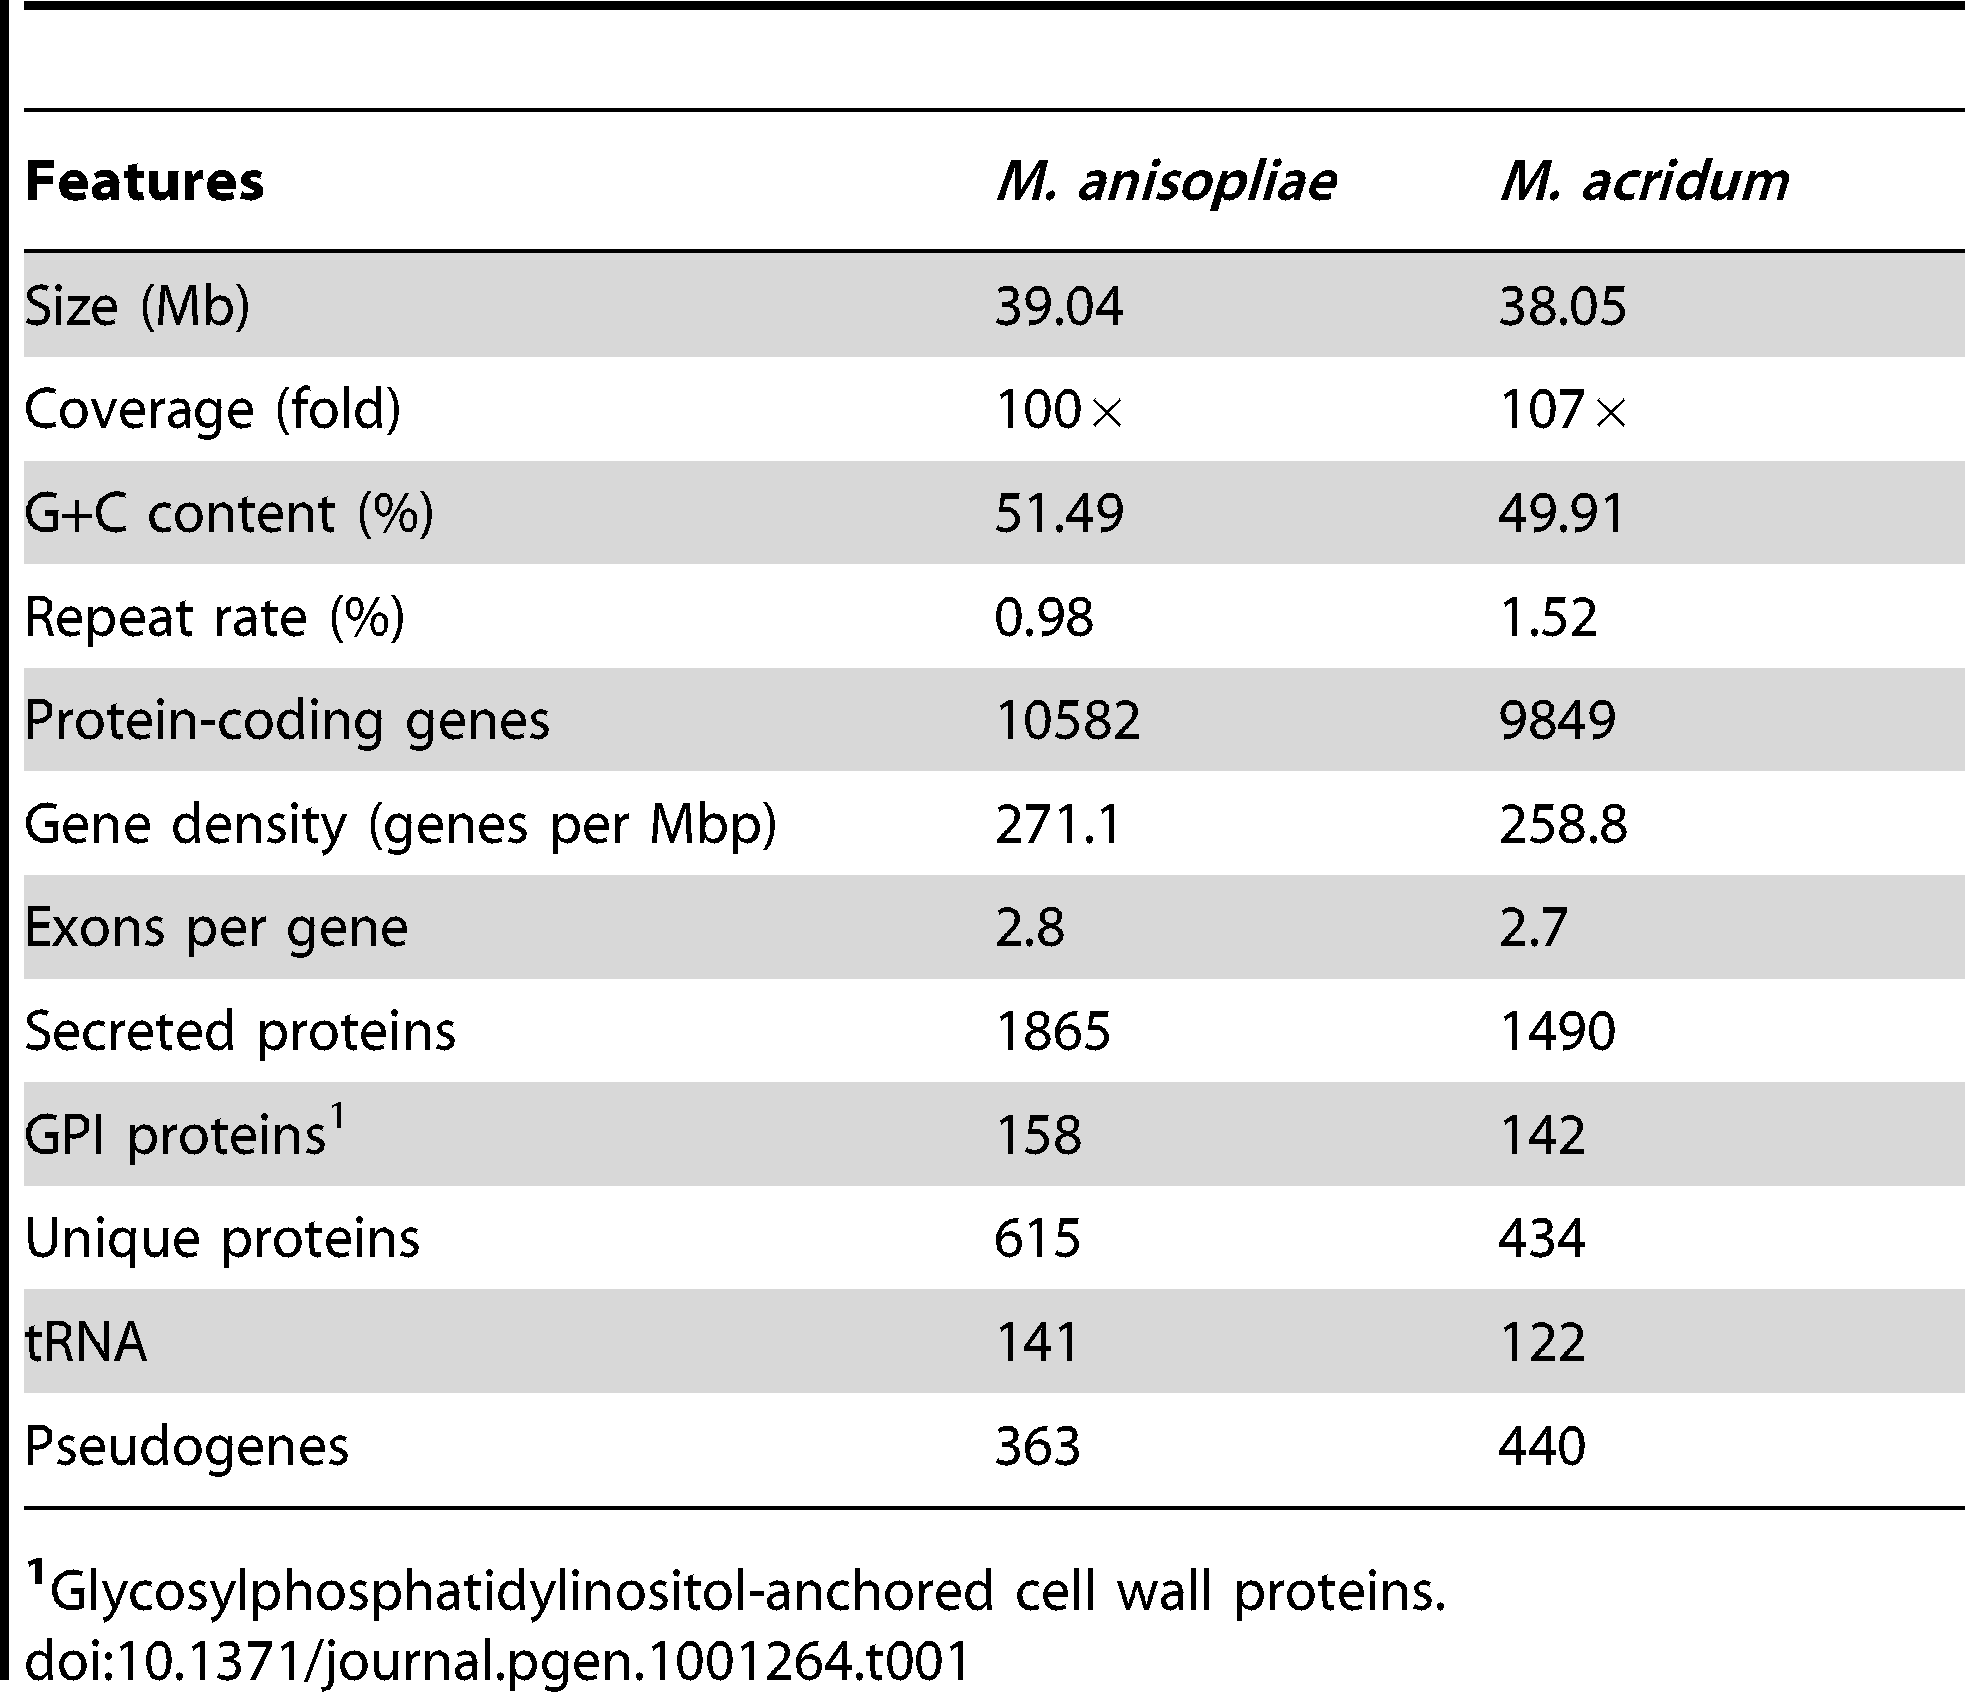 Main features of the <i>M. anisopliae</i> and <i>M. acridum</i> genomes.